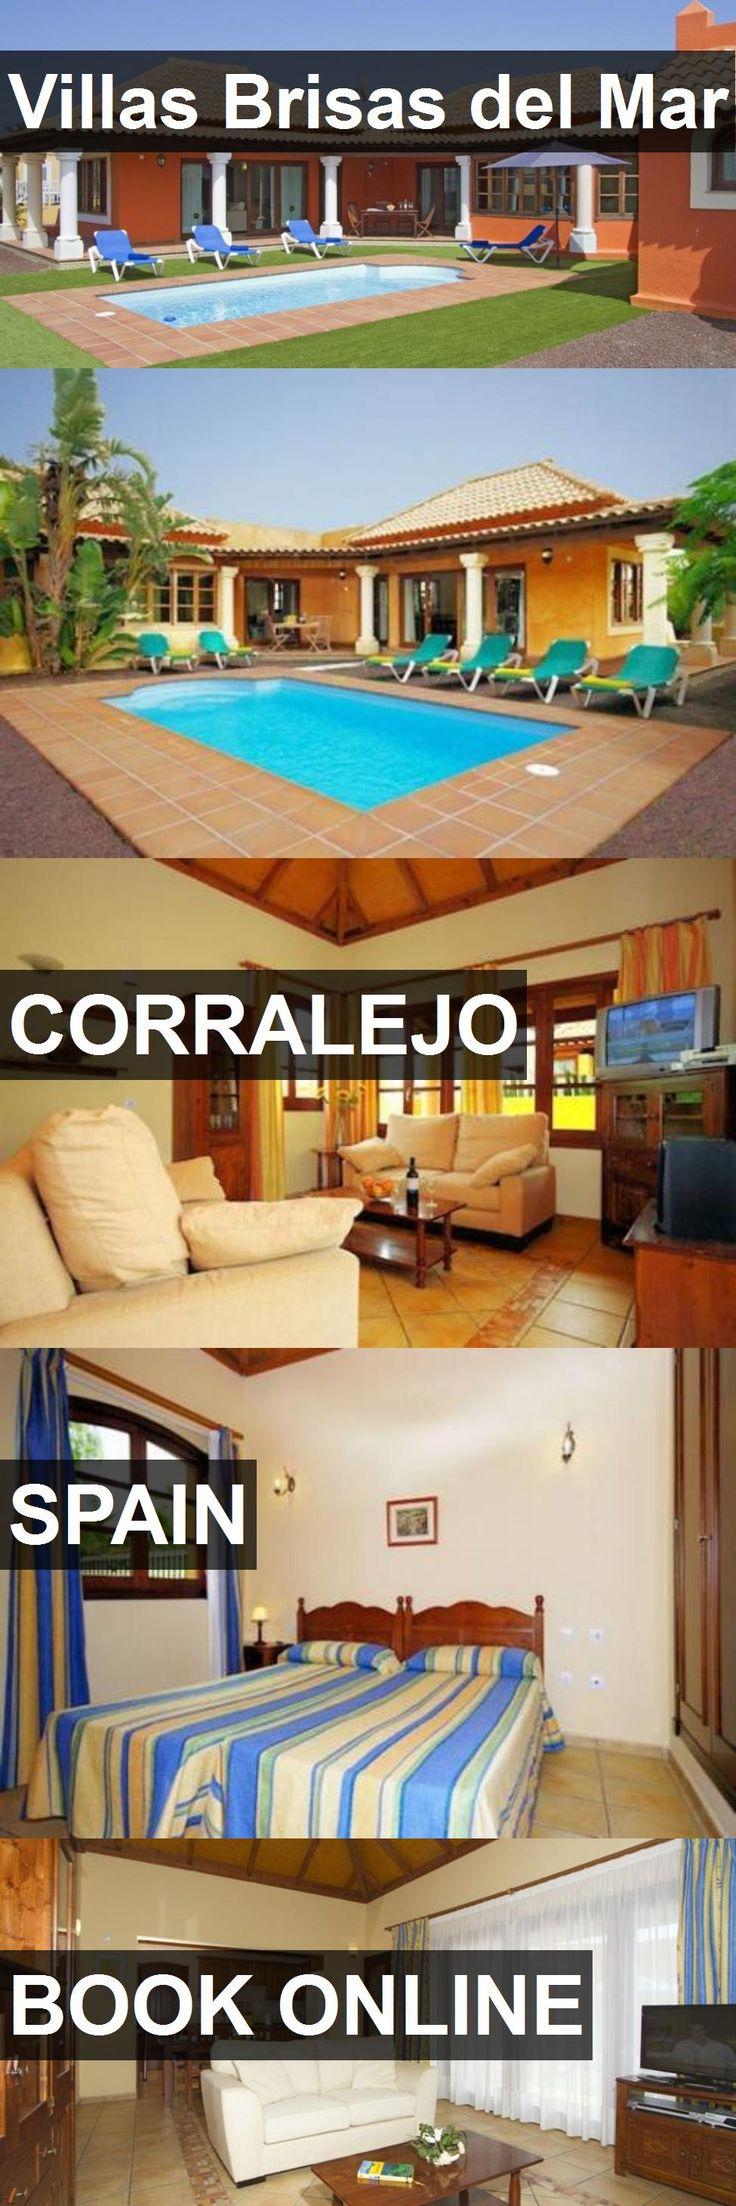 Hotel Villas Brisas del Mar in Corralejo, Spain. For more information, photos, reviews and best prices please follow the link. #Spain #Corralejo #hotel #travel #vacation